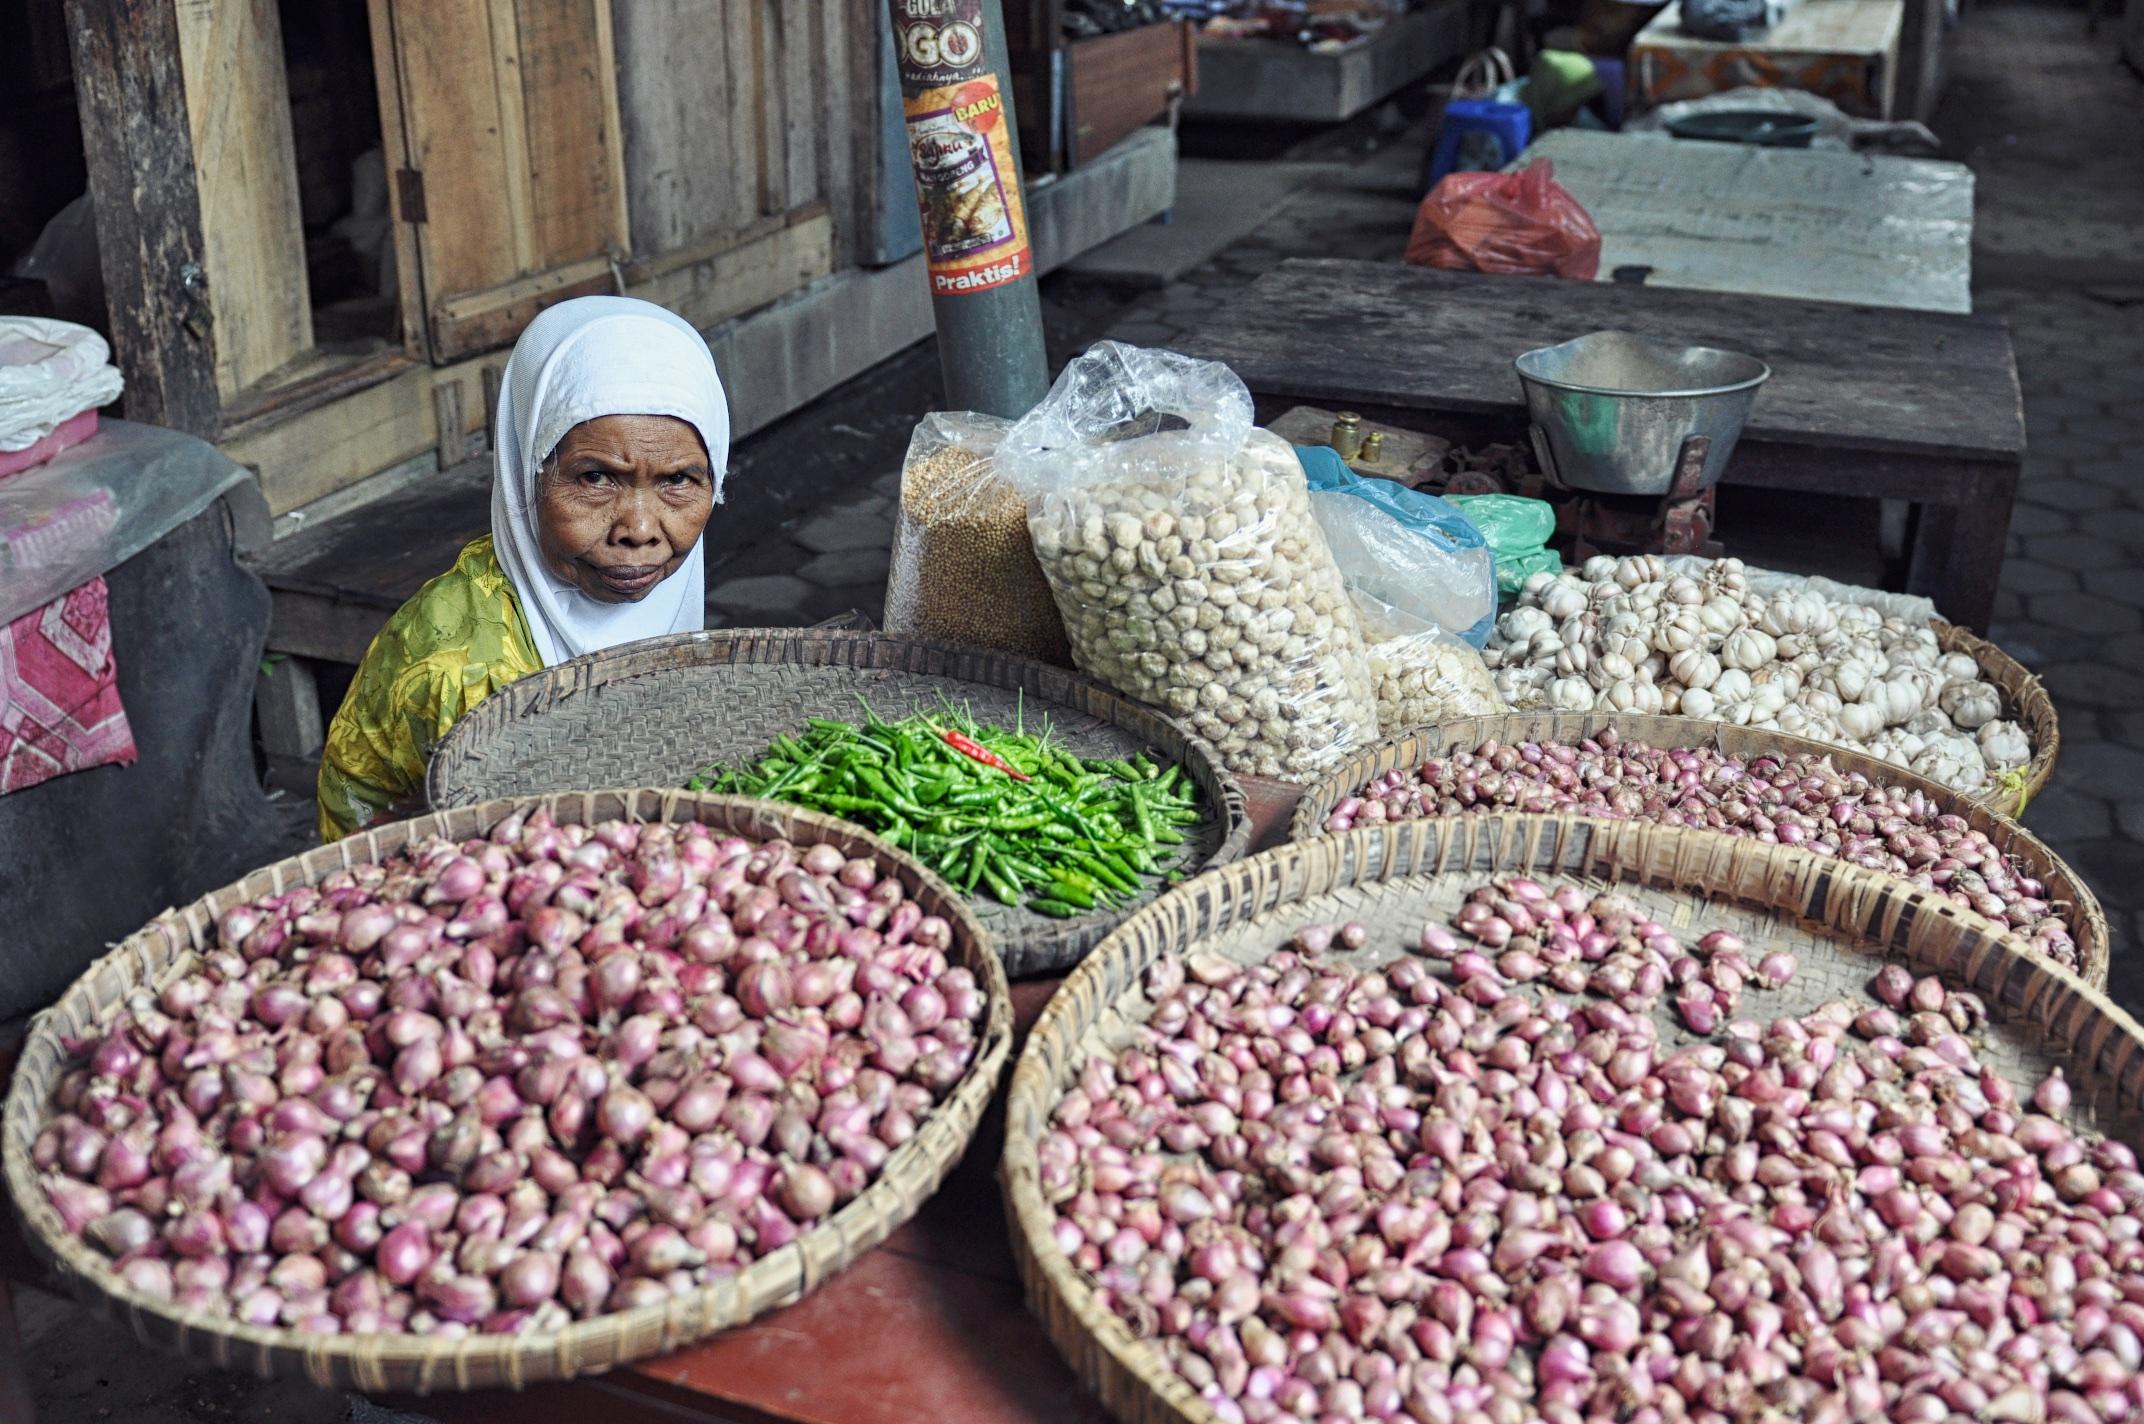 A local market vendor at Borobudur Market in Central Java, Indonesia| © Chavelli Tsui www.chavelli.com